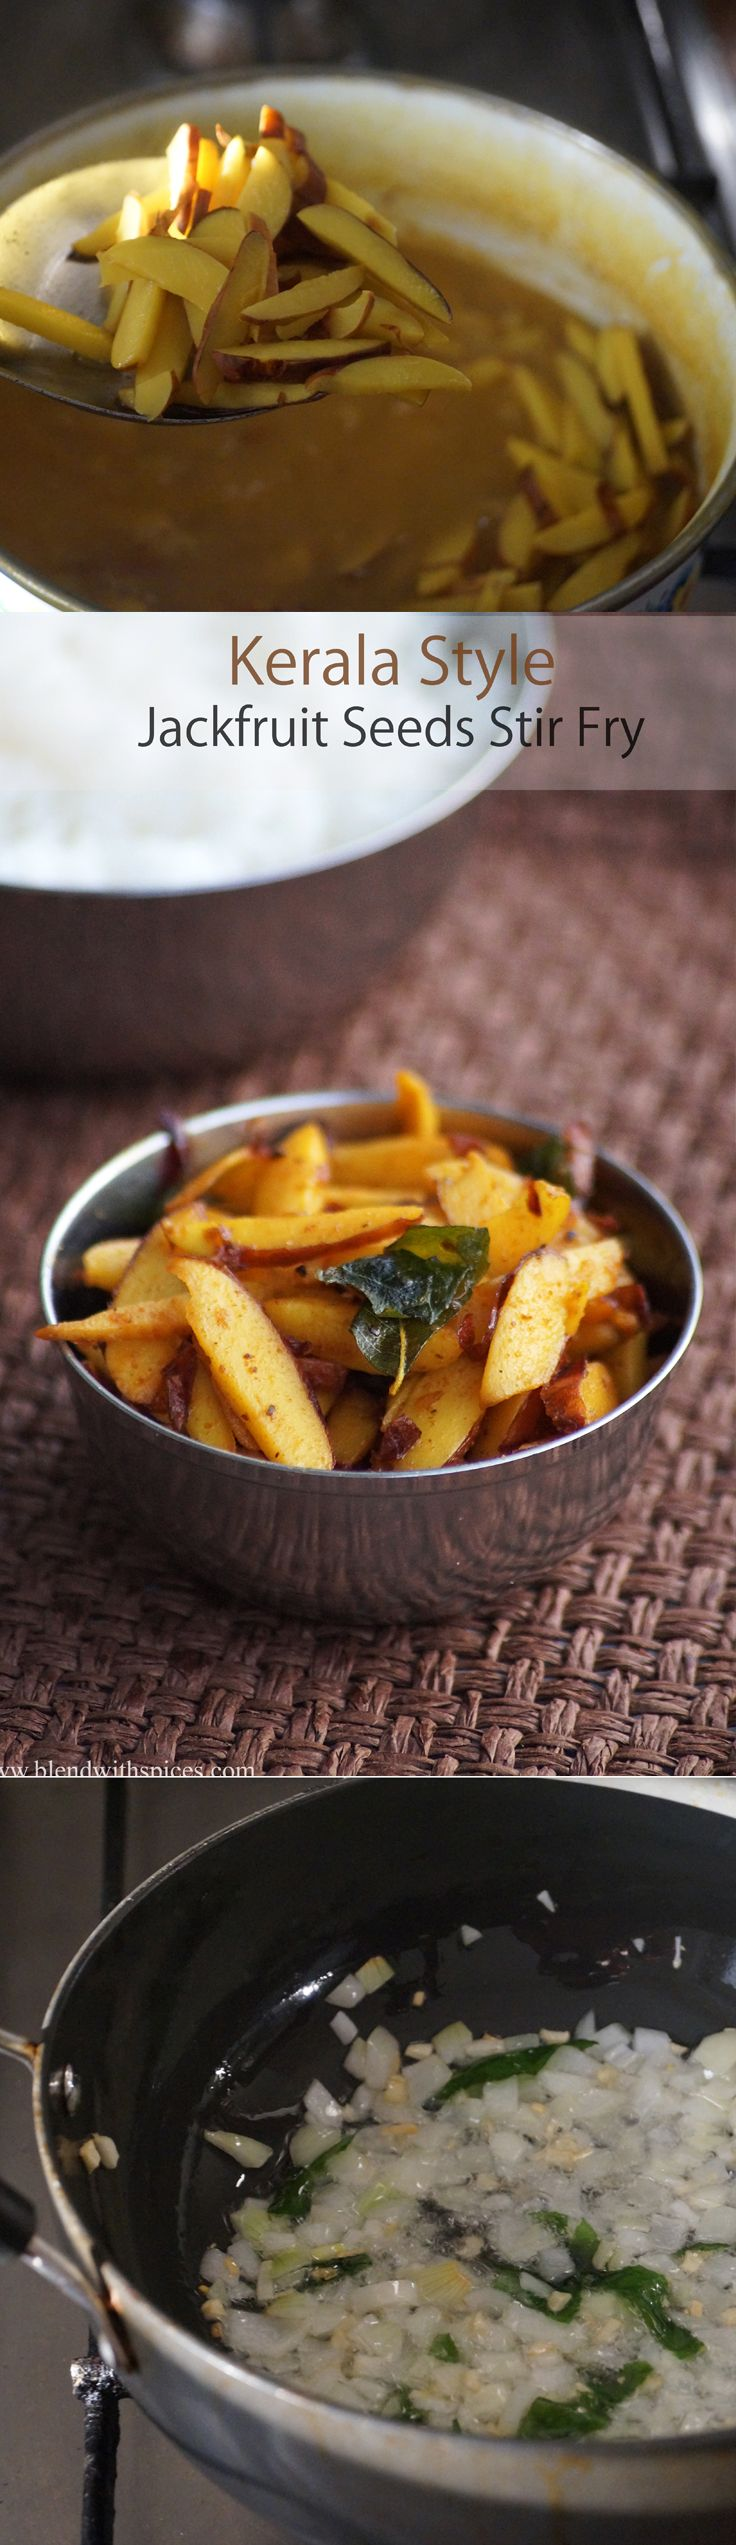 Chakkakuru Mezhukkupuratti Recipe / Kerala Style Jackfruit Seeds Stir Fry Recipe with step by step pictures and VIDEO.... #indianfood #recipes blendwithspices.com